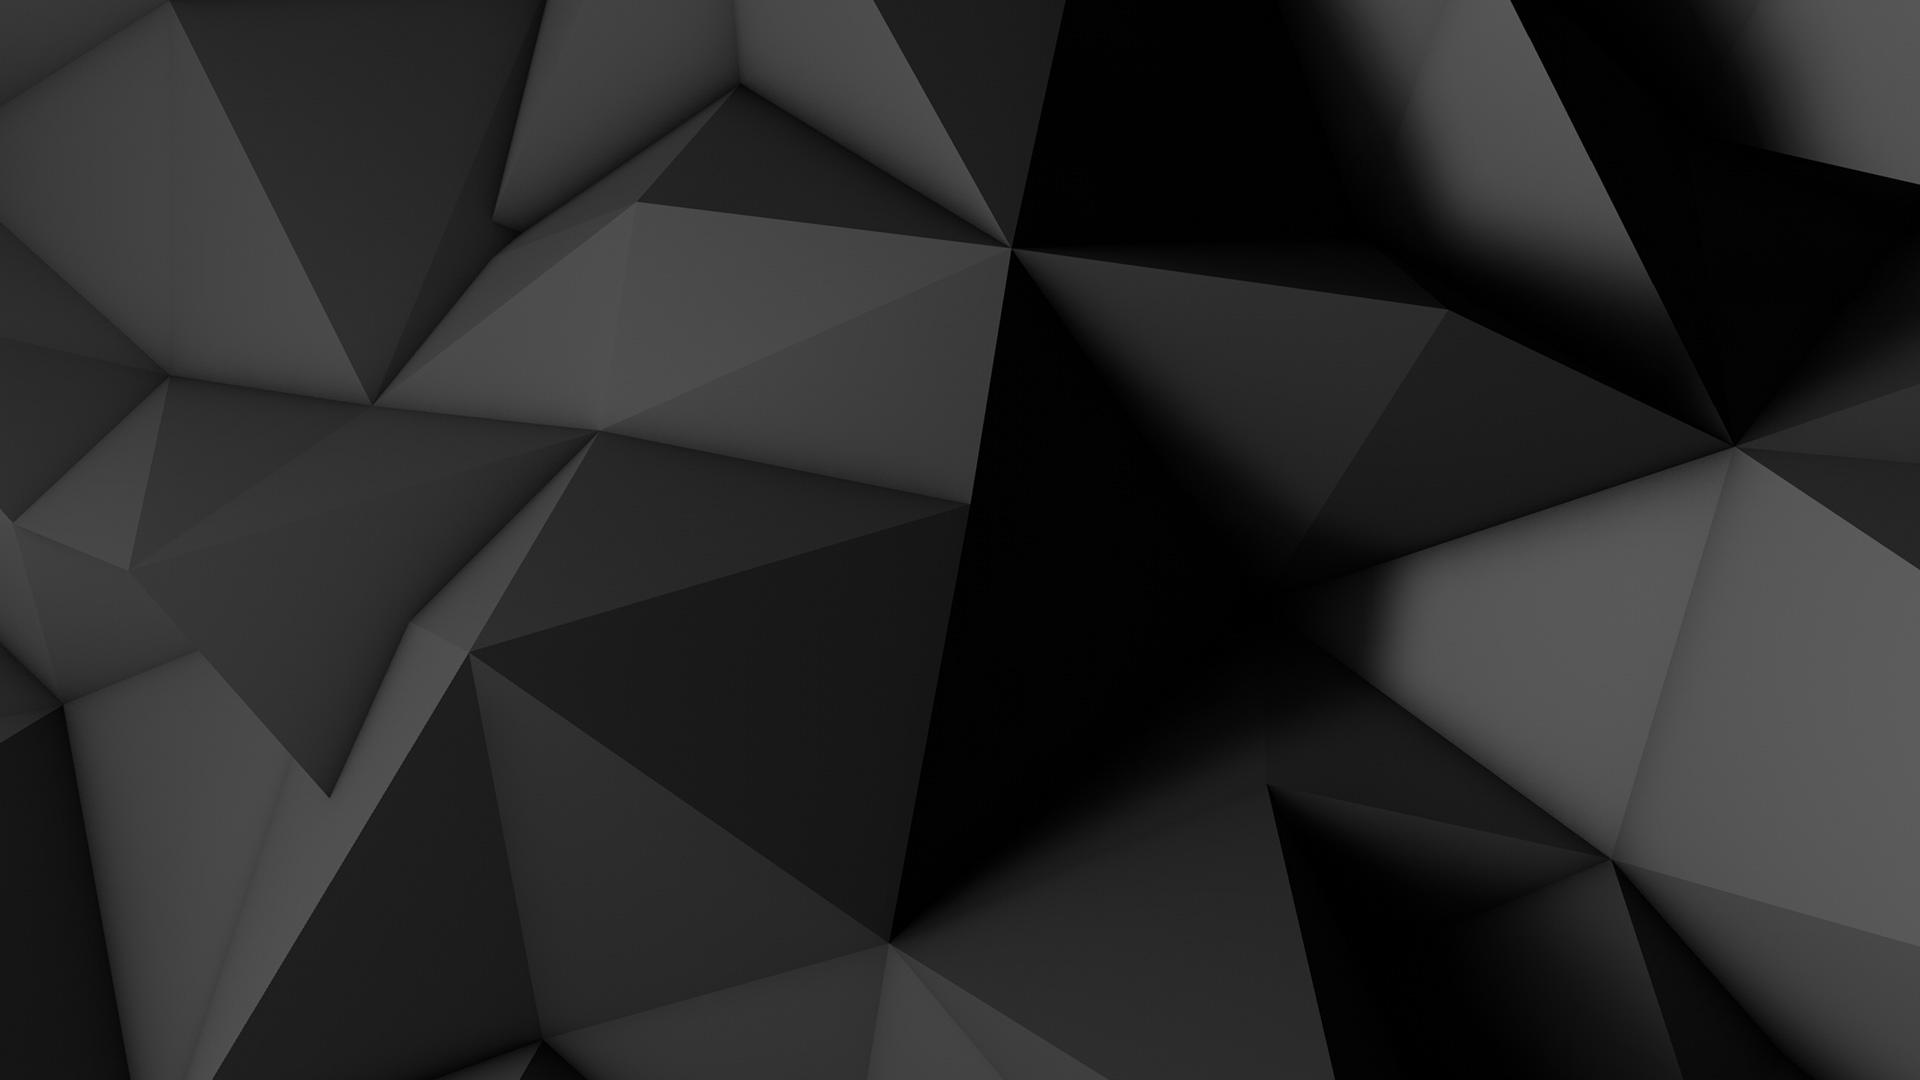 Black Diamond Wallpaper HD | PixelsTalk.Net